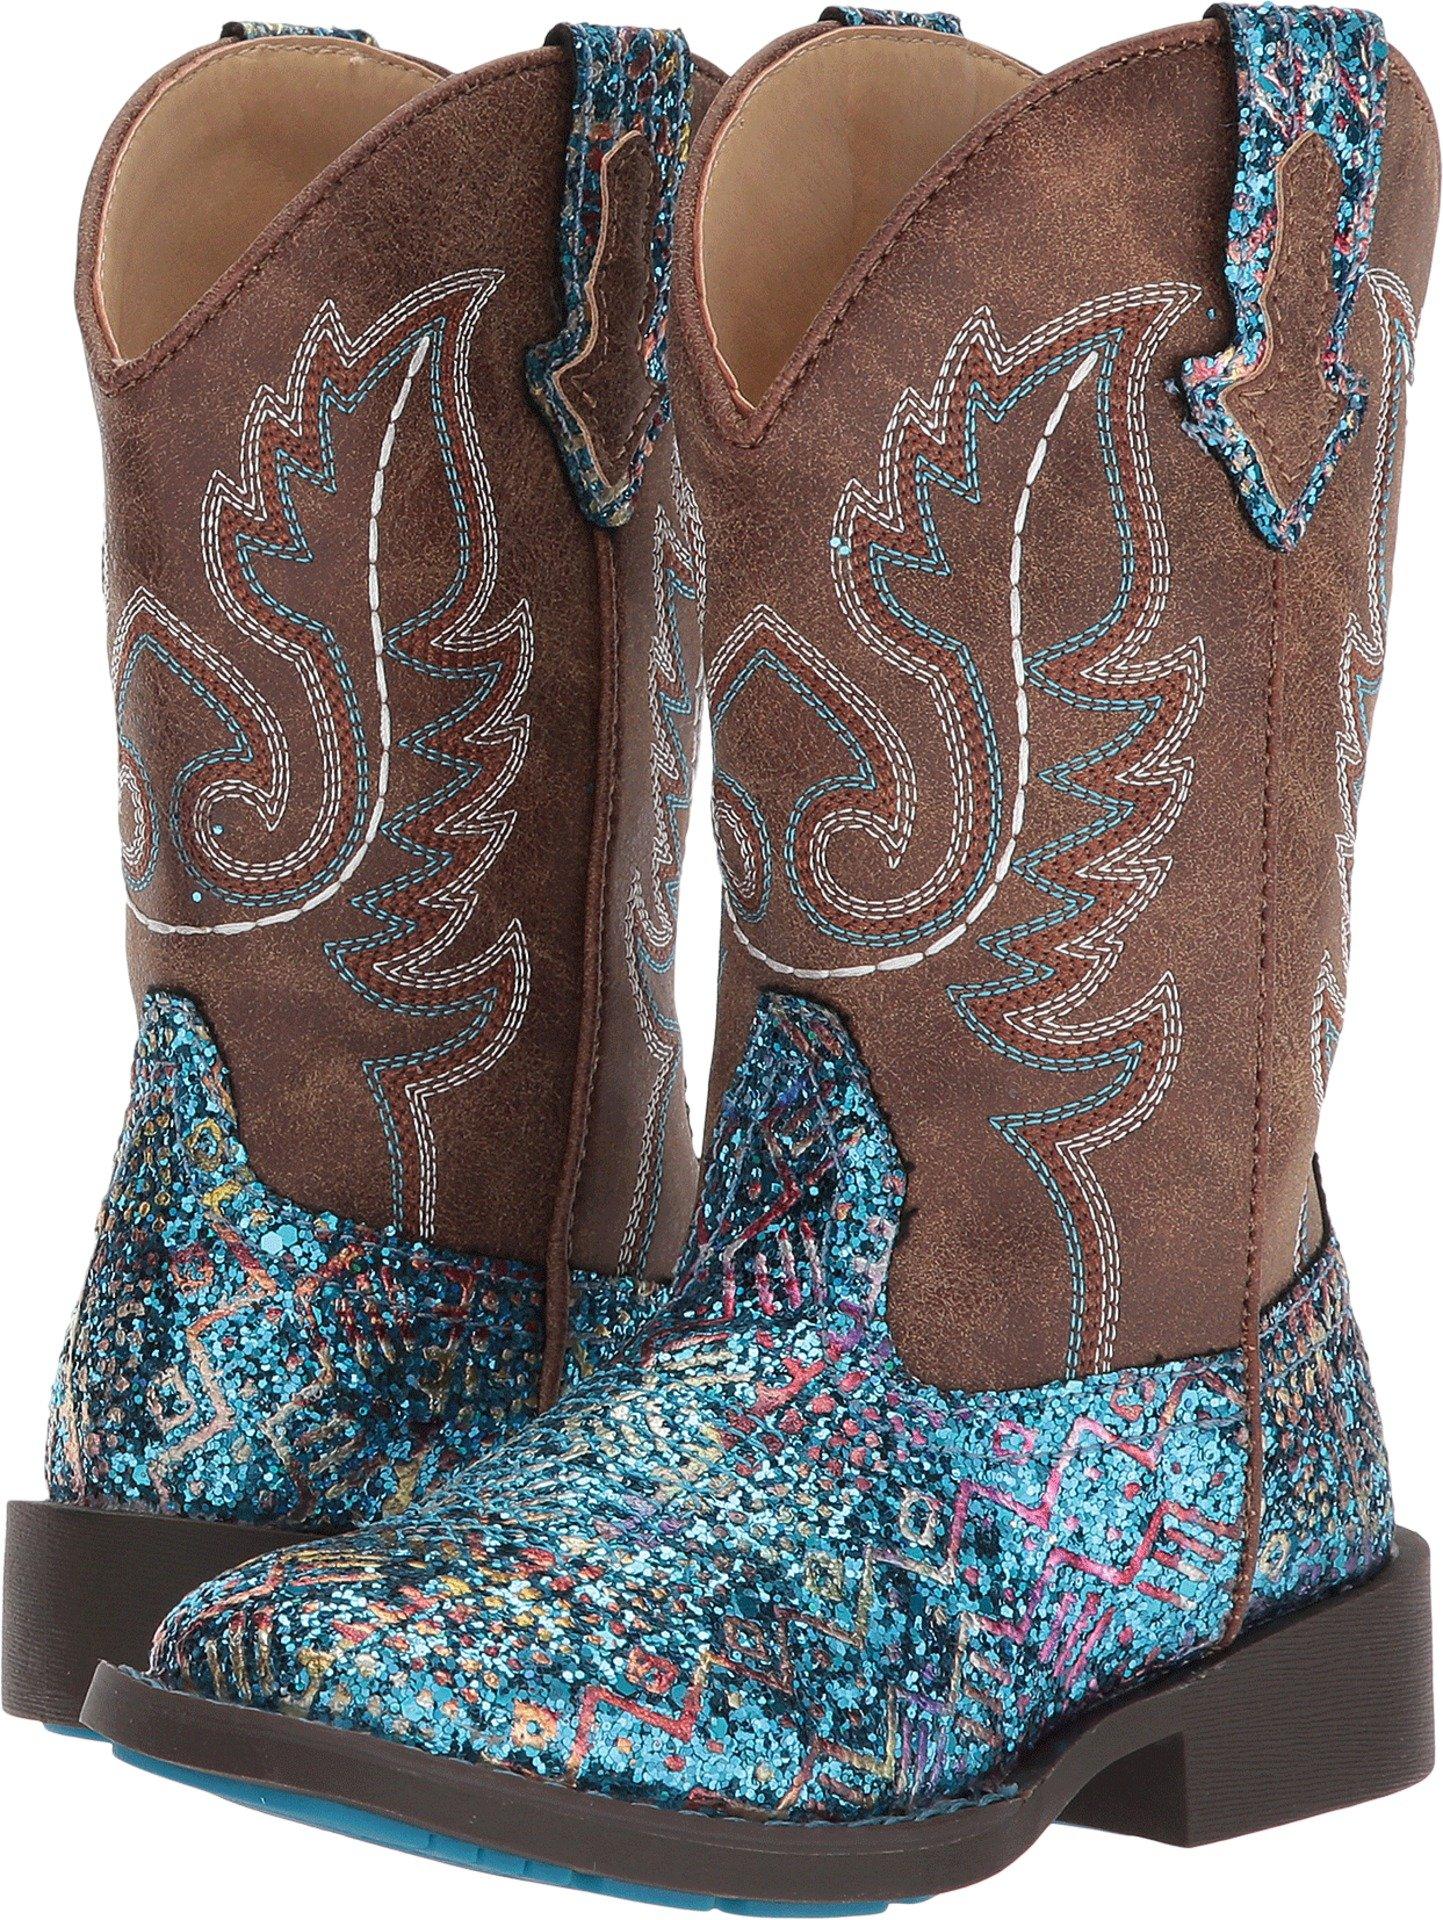 Roper Girls' Glitter Aztec Cowgirl Boot Square Toe Blue 10 D